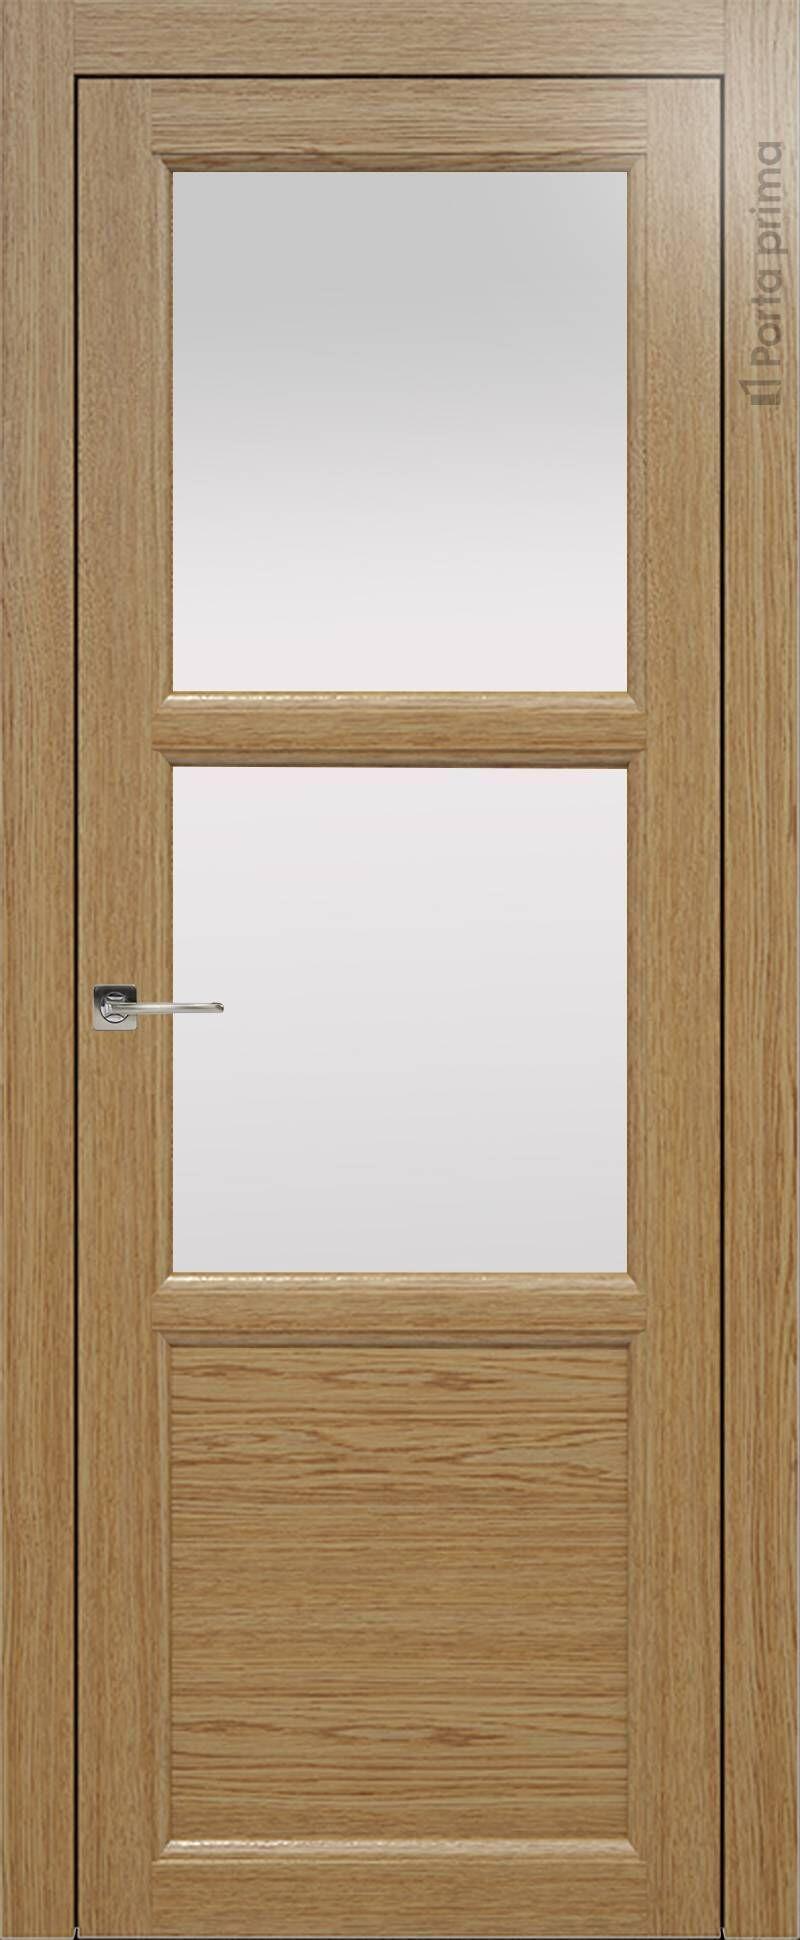 Sorrento-R Б2 цвет - Дуб карамель Со стеклом (ДО)